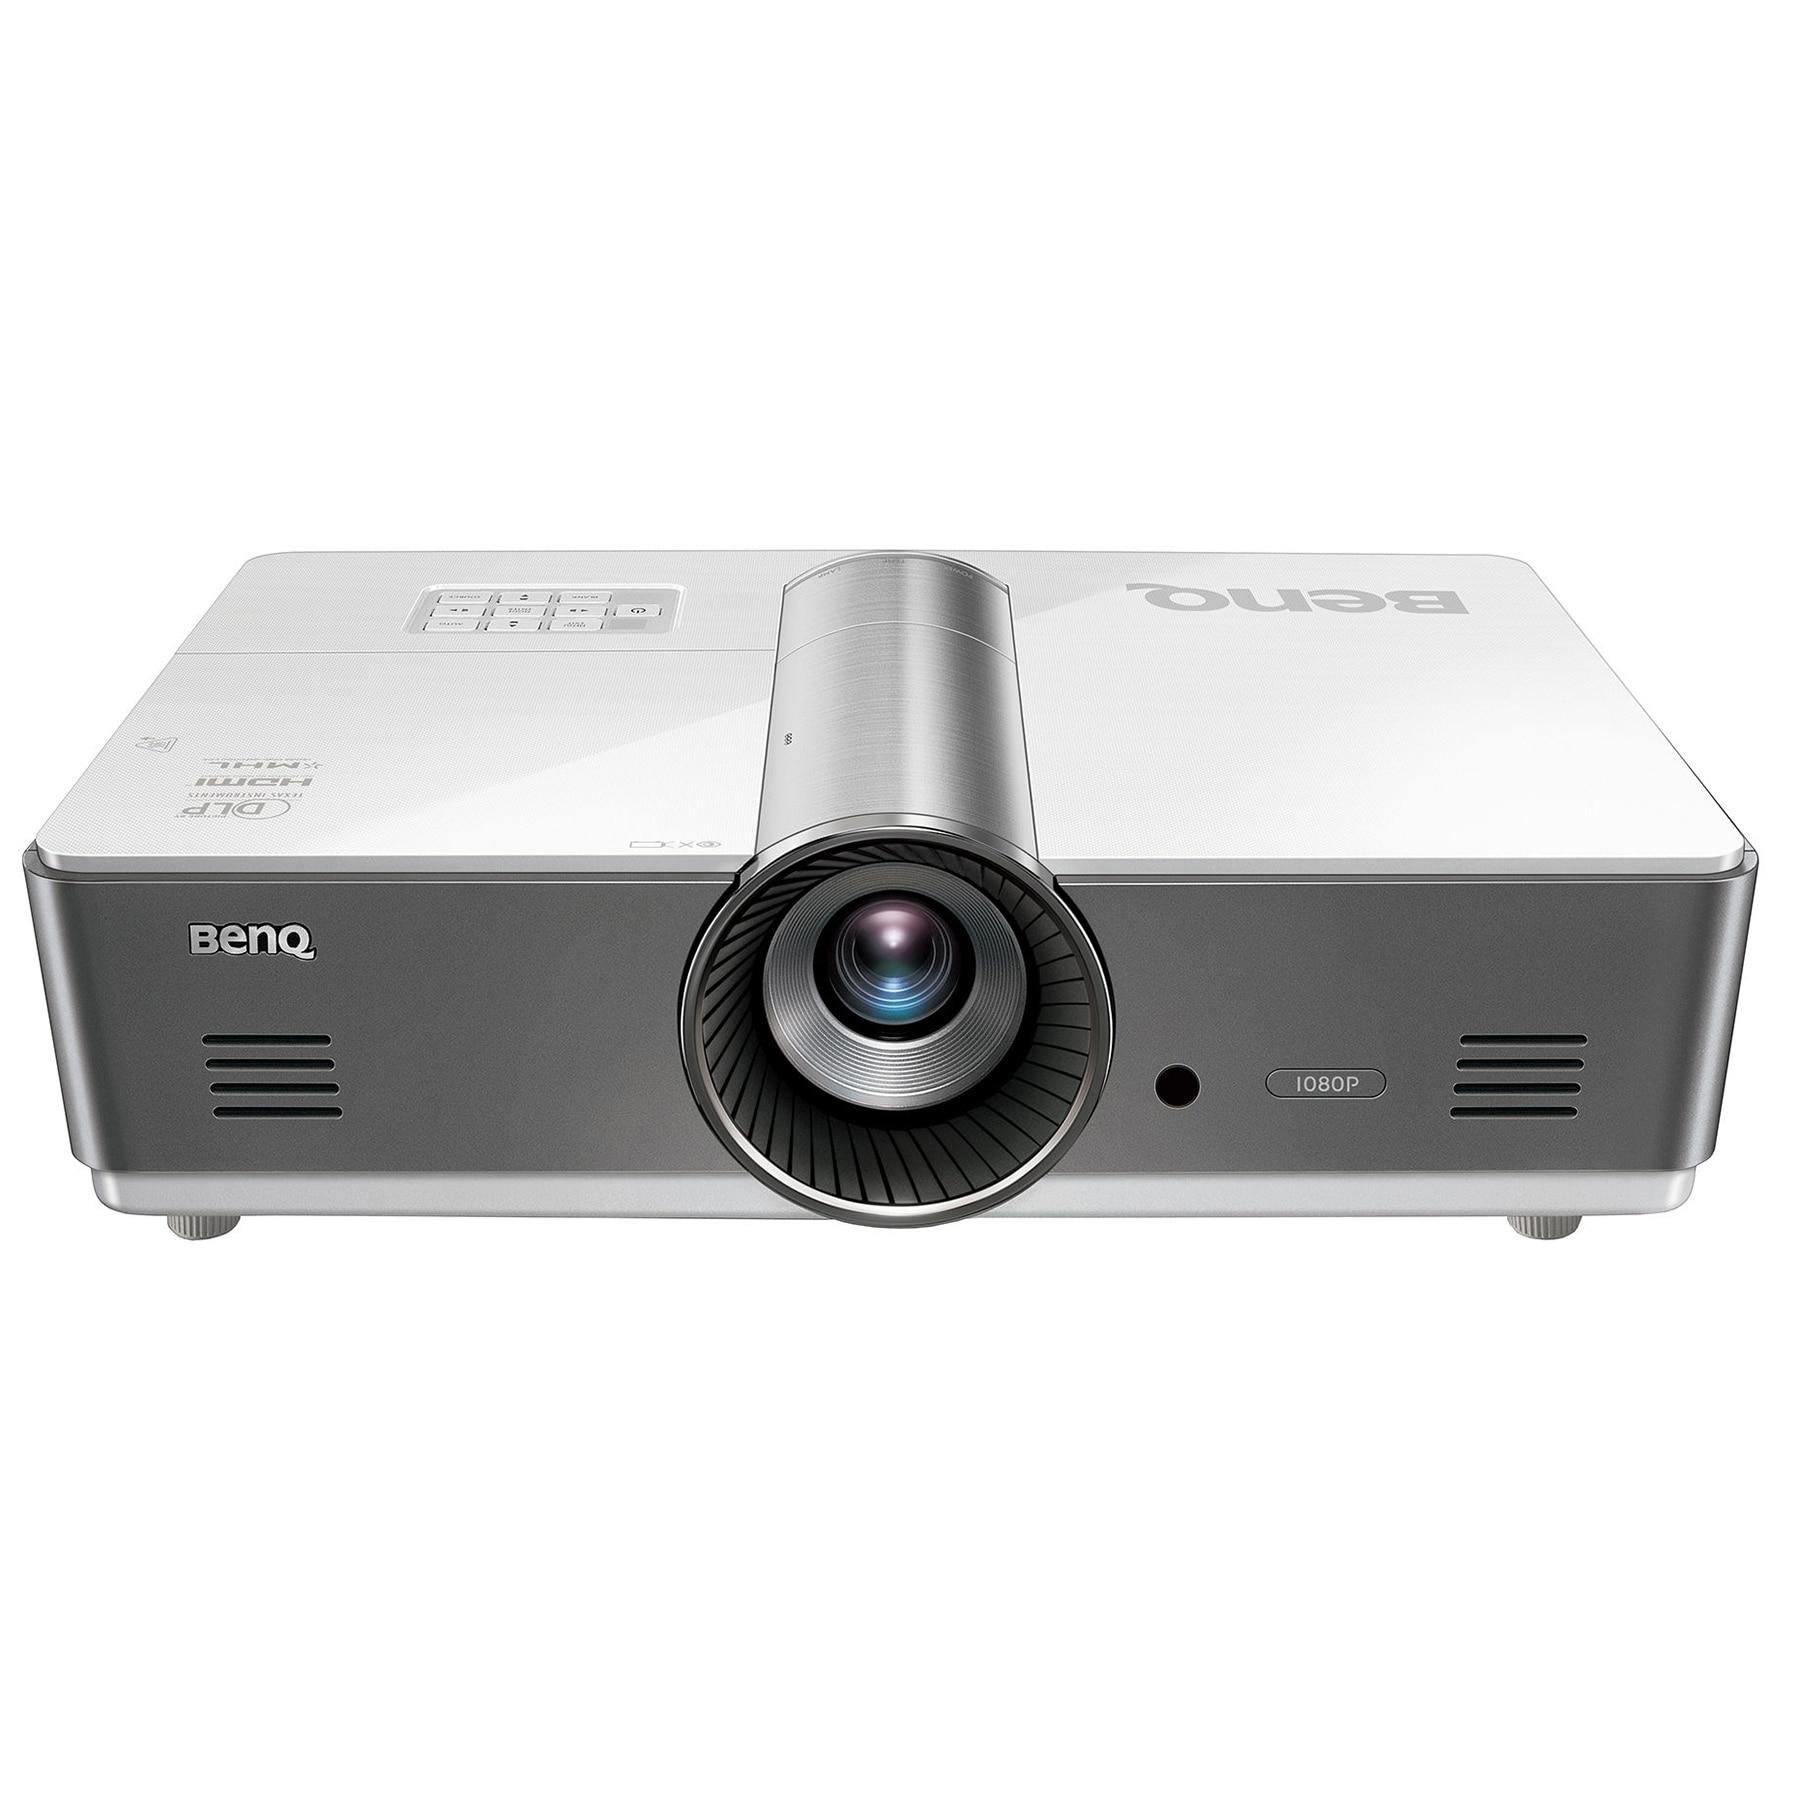 Fotografie Videoproiector BenQ MH760, FullHD, 5000 lumeni, Zoom 1.5x, Lens Shift, Corner fit, LAN, MDA